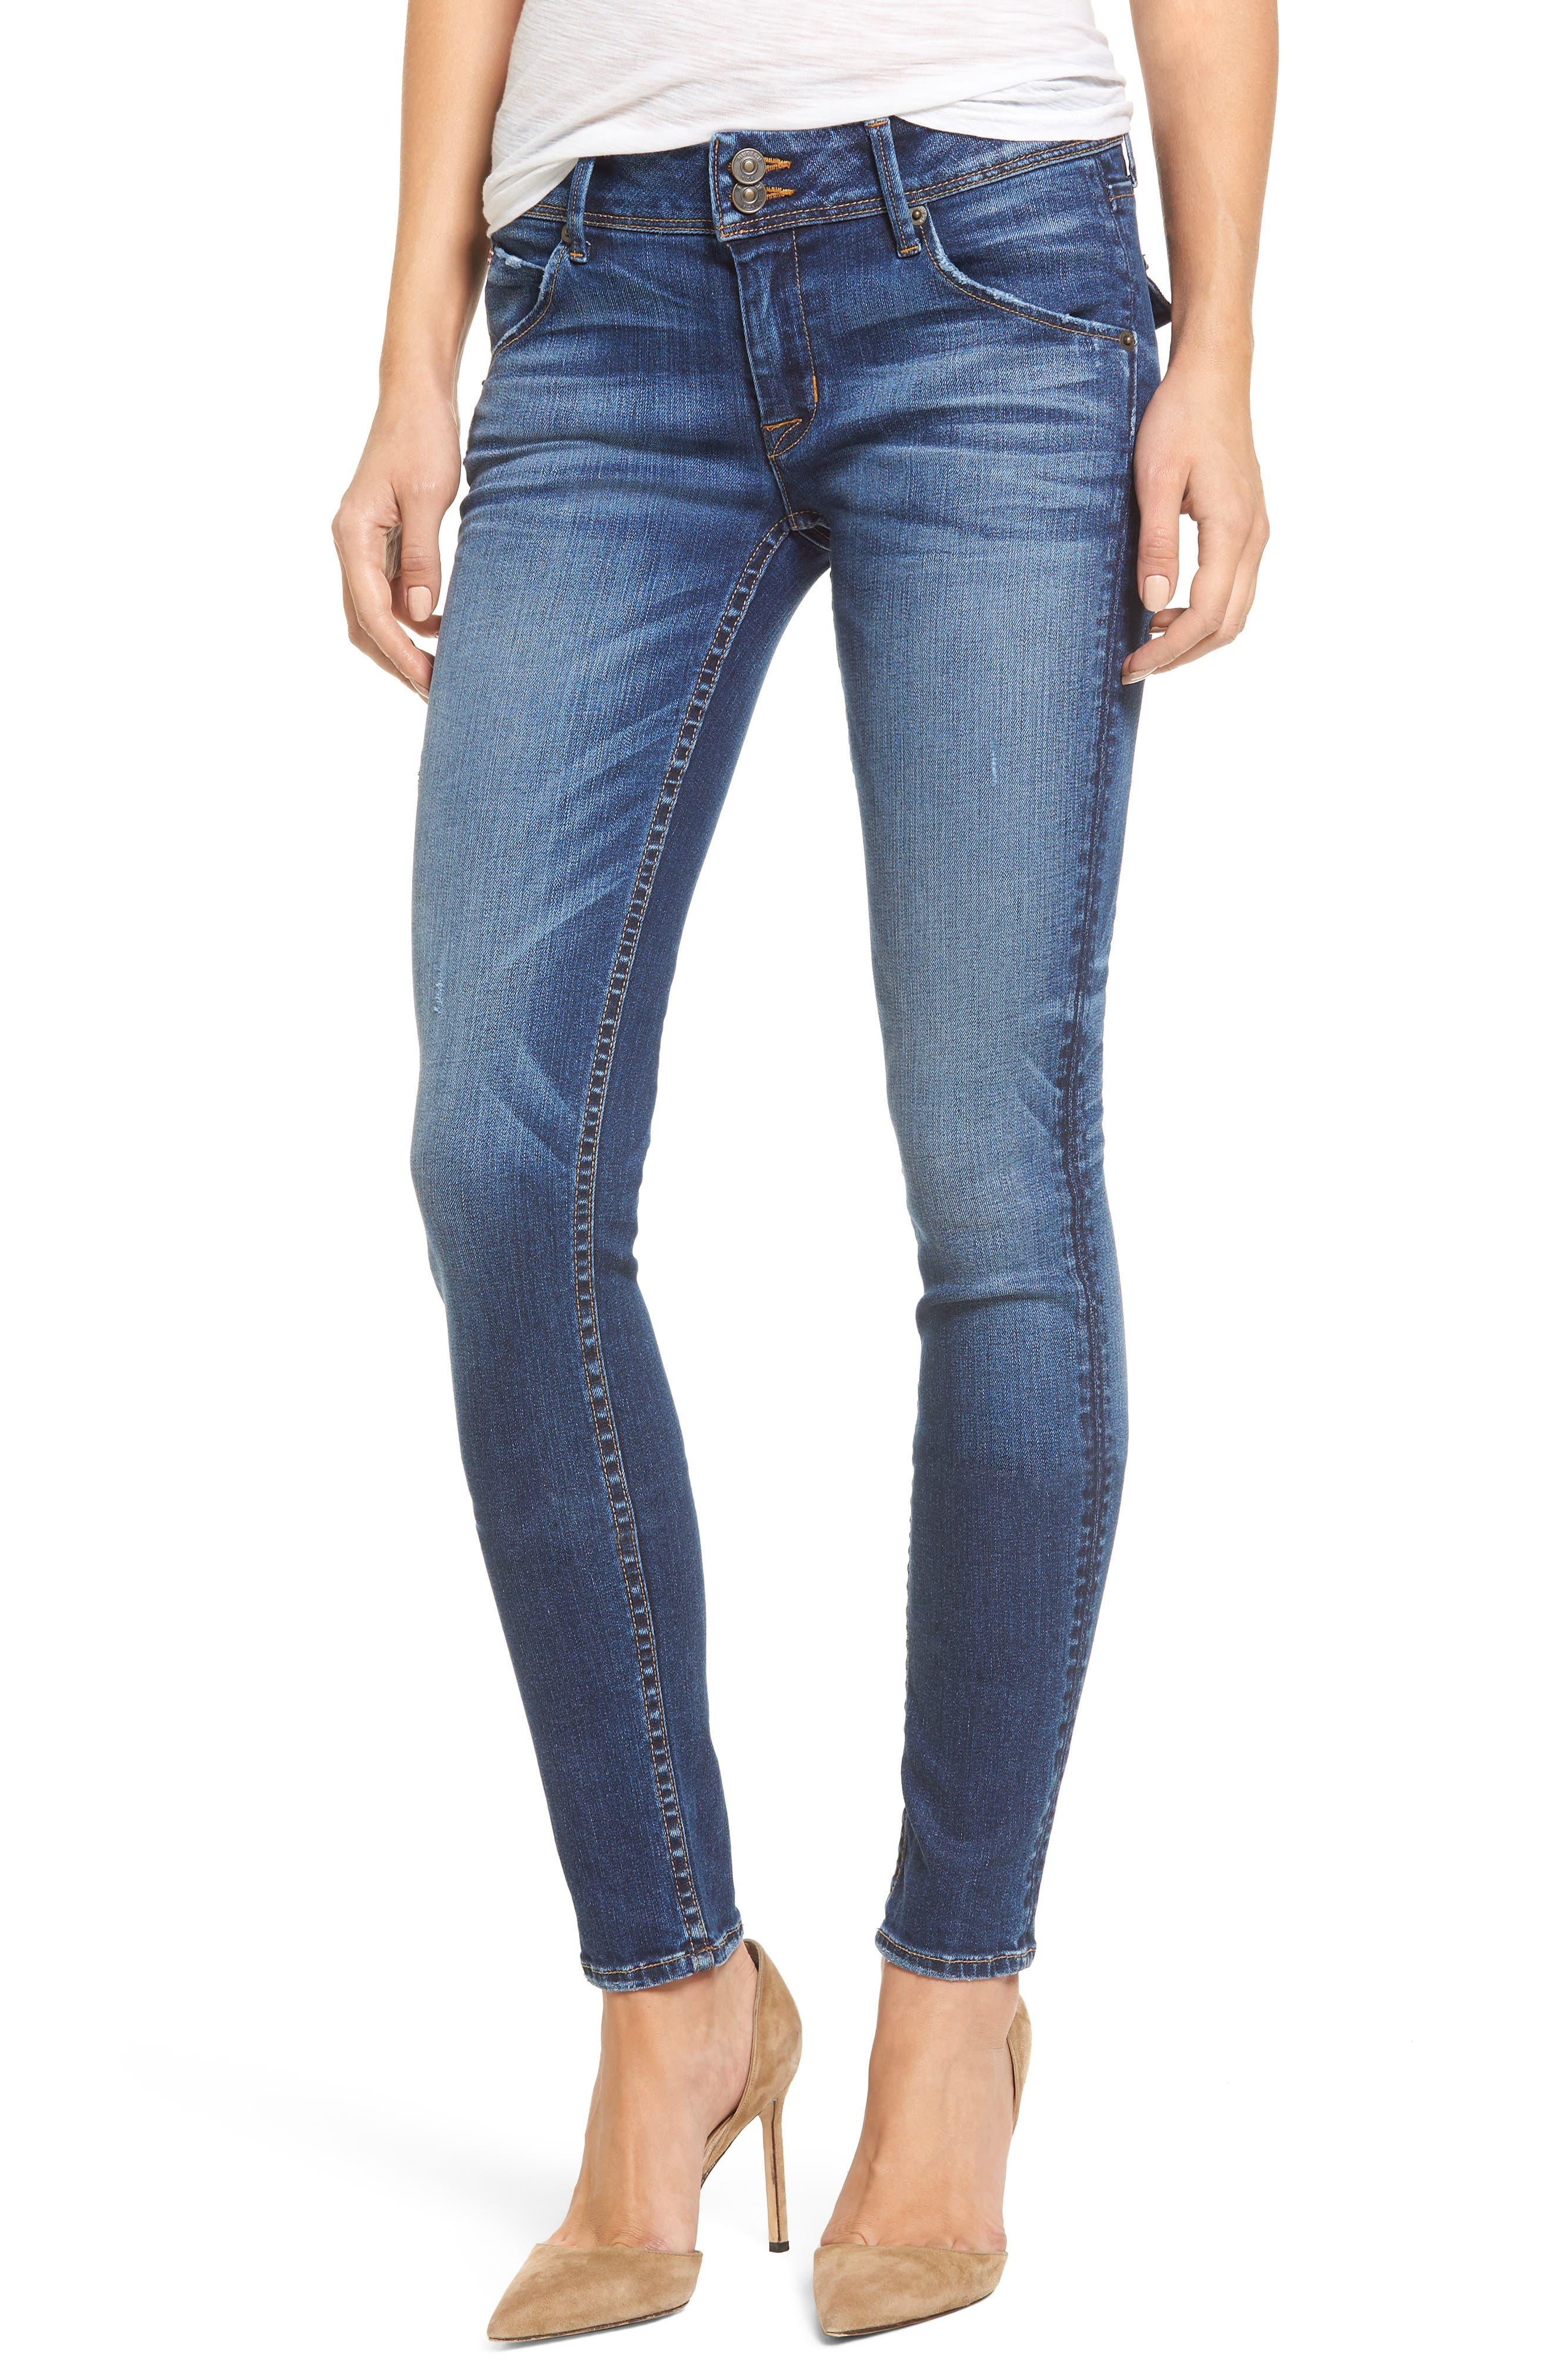 Main Image - Hudson Jeans Collin Supermodel Skinny Jeans (Contender)